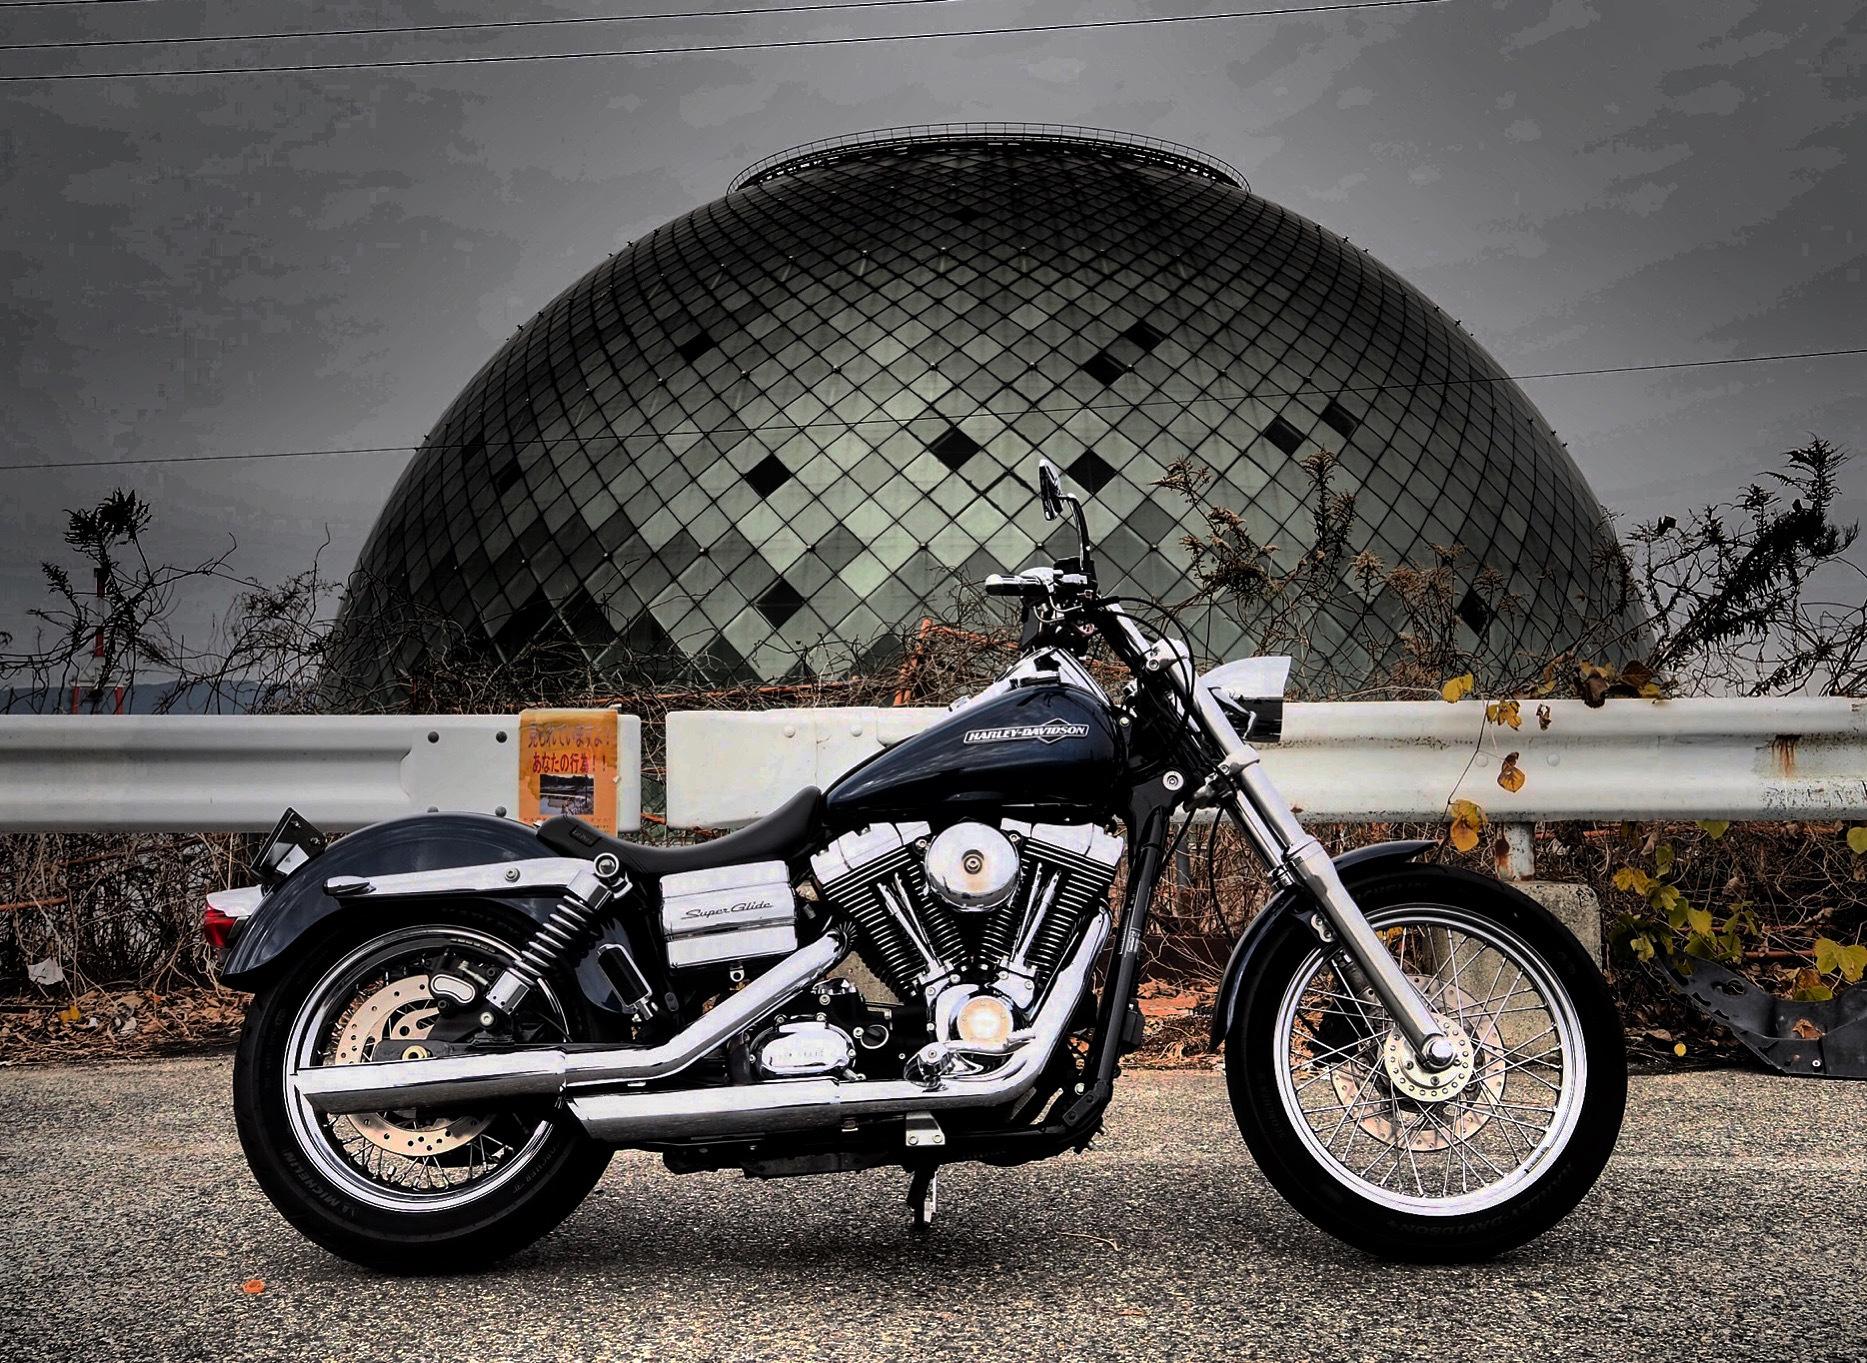 harleydavidson-motorcycle-touring-blog-osaka-port-museum.jpg